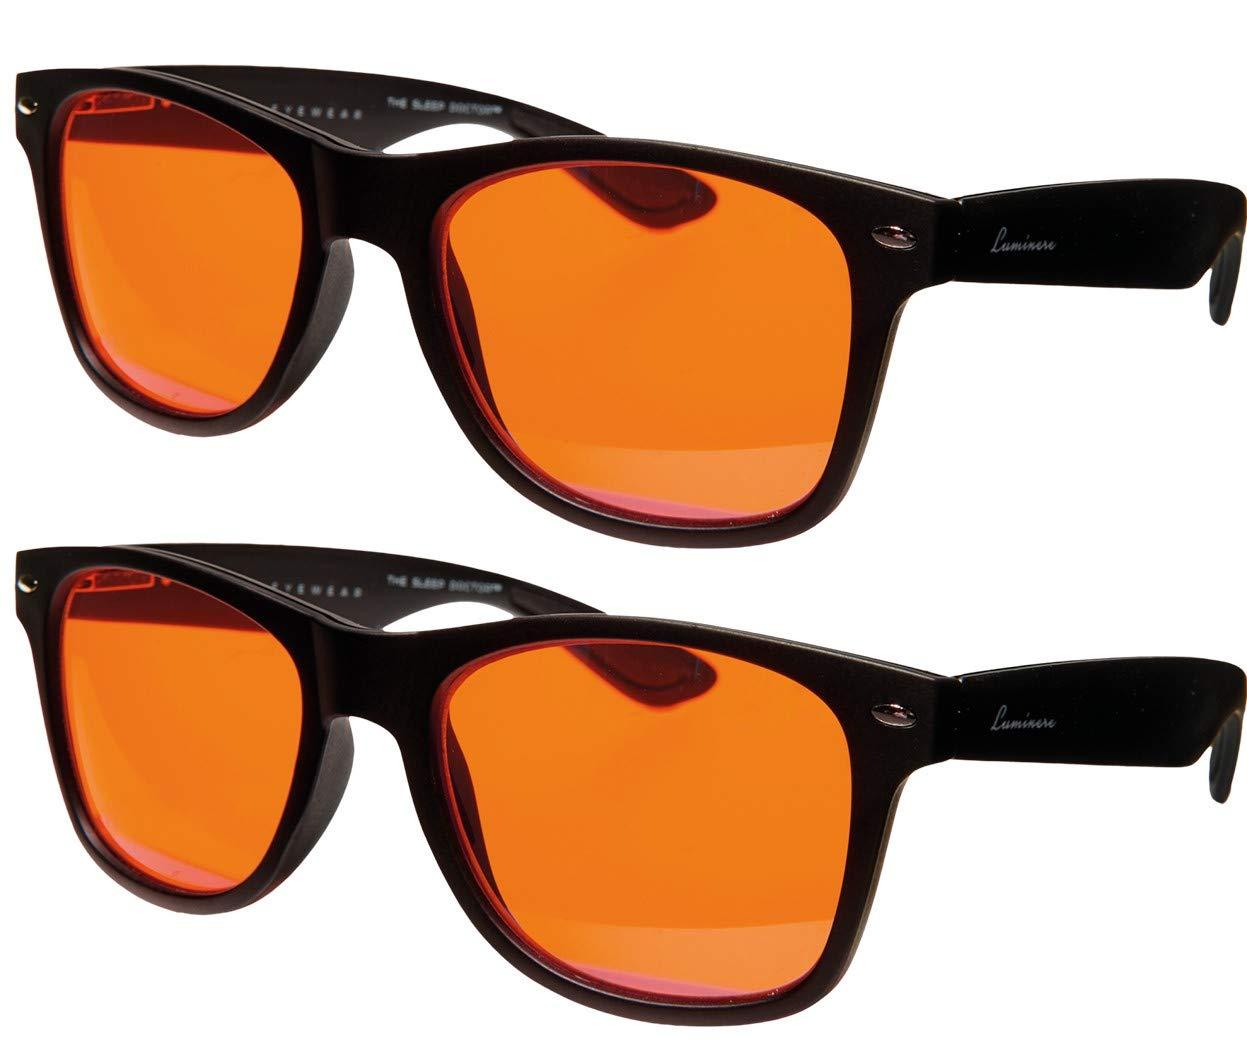 c276fb9241f Sleep Doctor Luminere Blue Light Blocking Glasses + Sunglasses product image